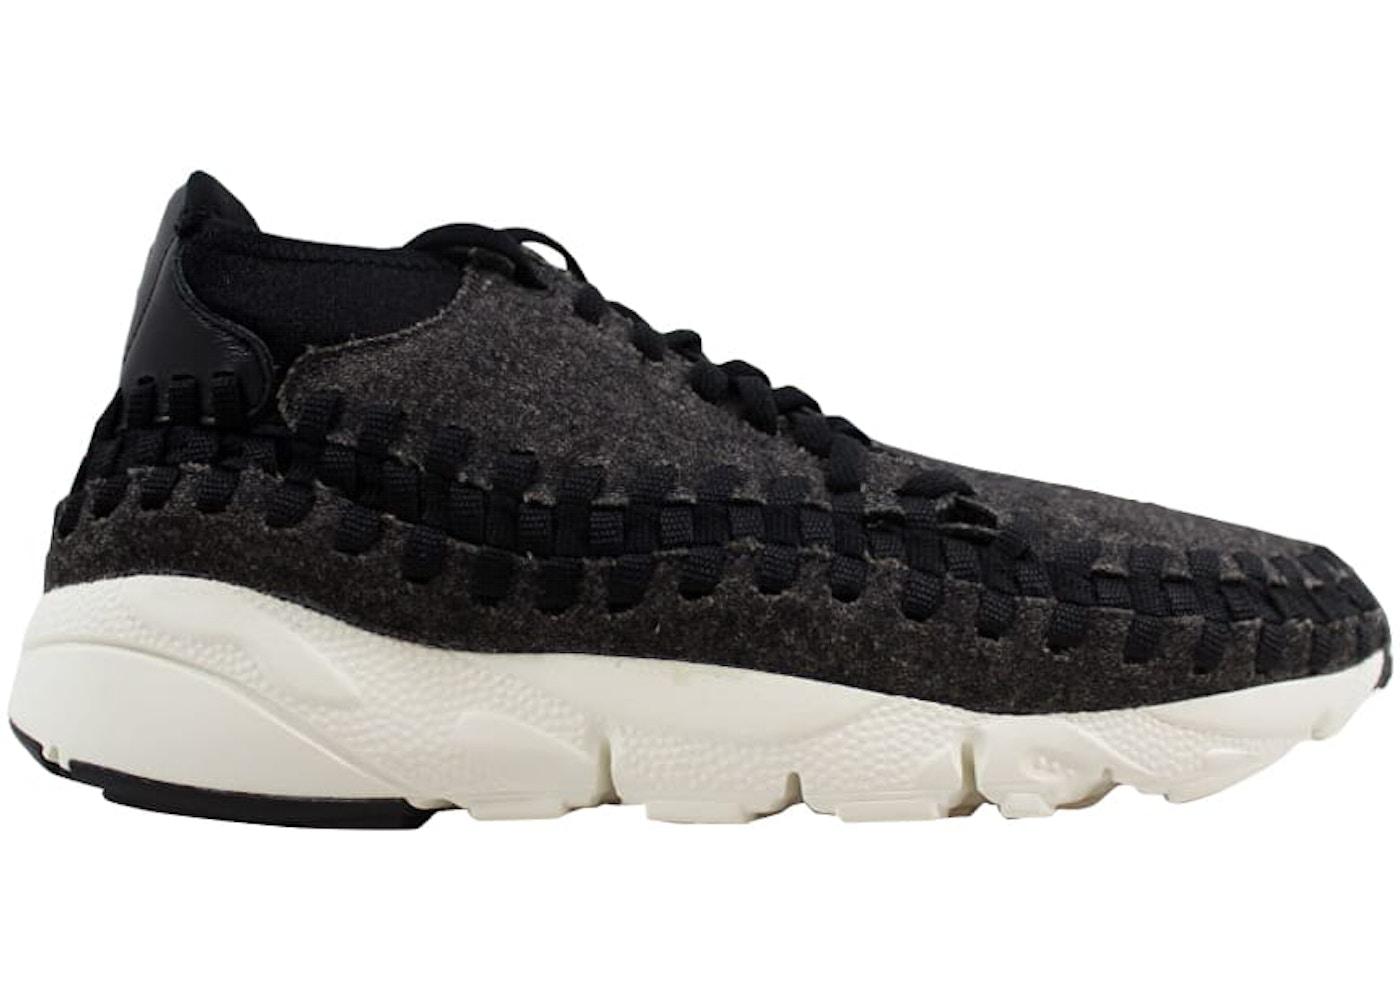 reputable site 9f980 651b7 Nike Air Footscape Woven Chukka SE Black Black-Ivory